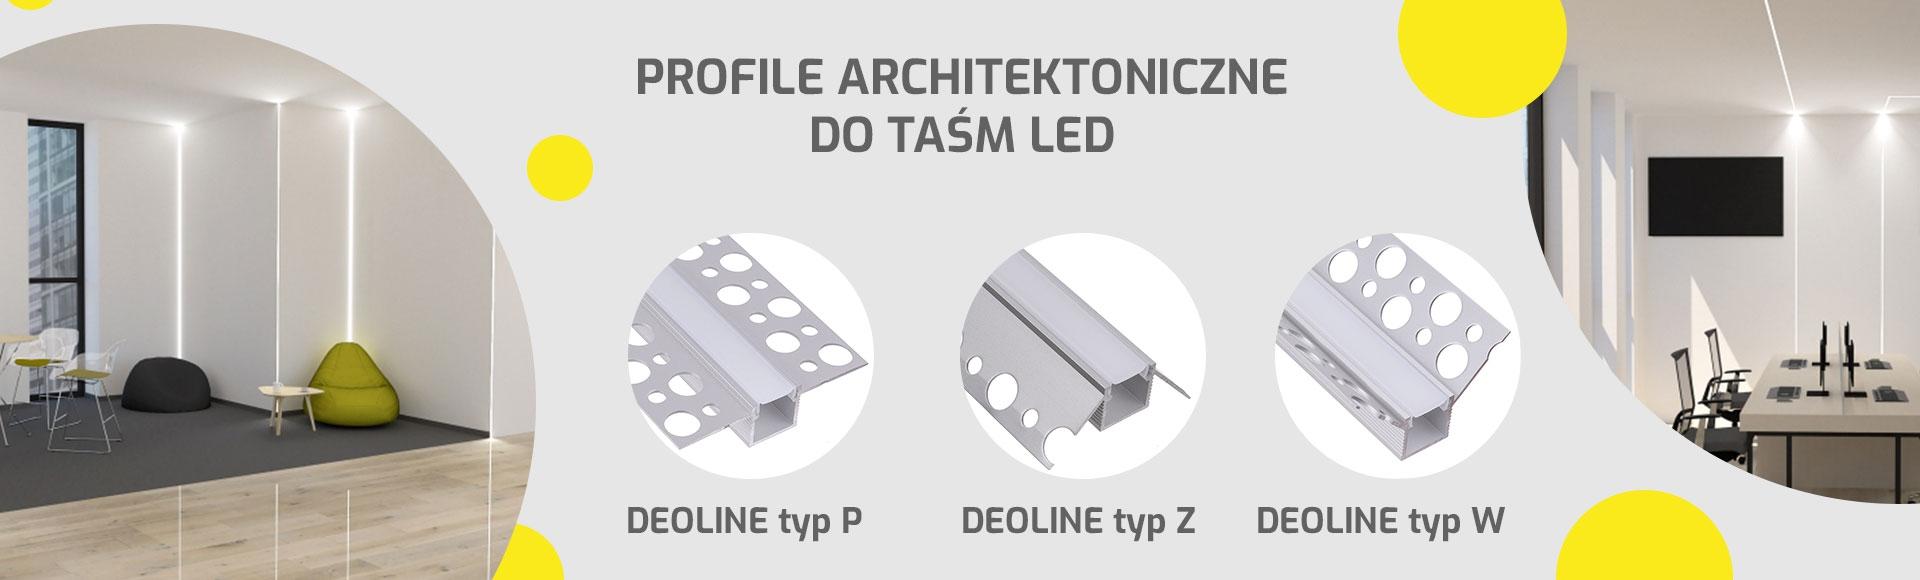 PROFILE ALUMINIOWE LED ARCHITEKTONICZNE